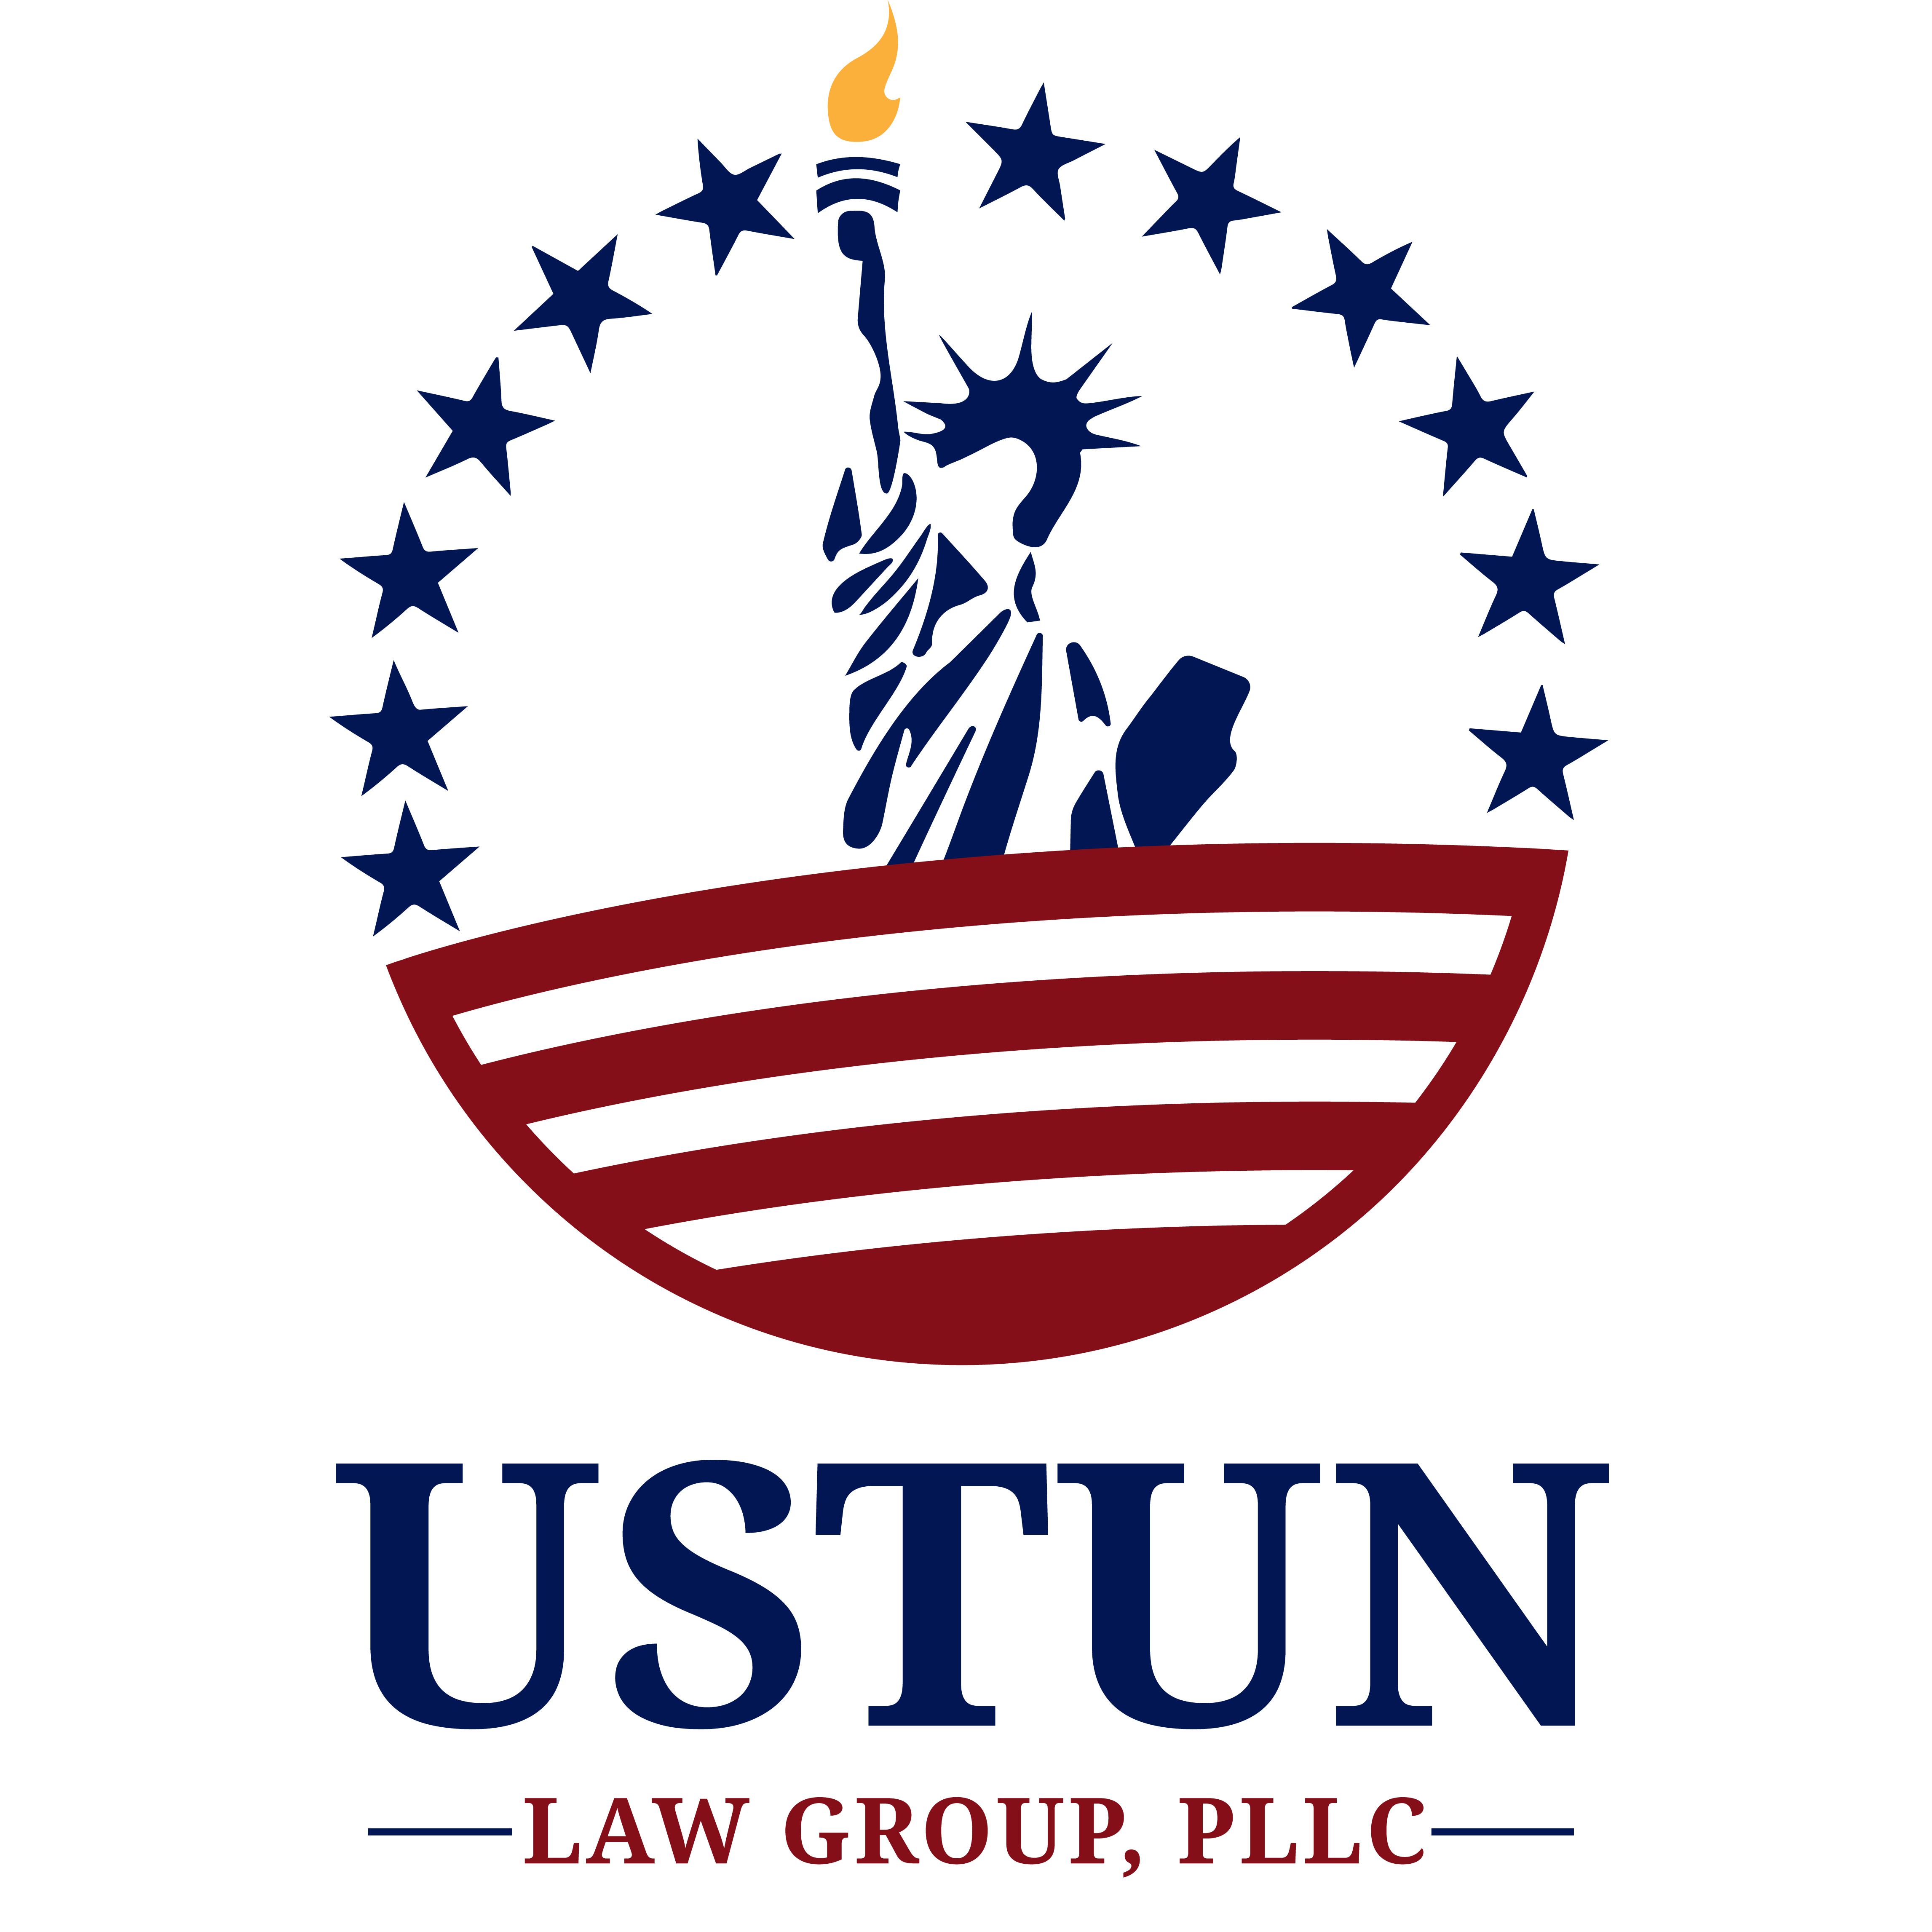 Ustun Law Group, PLLC